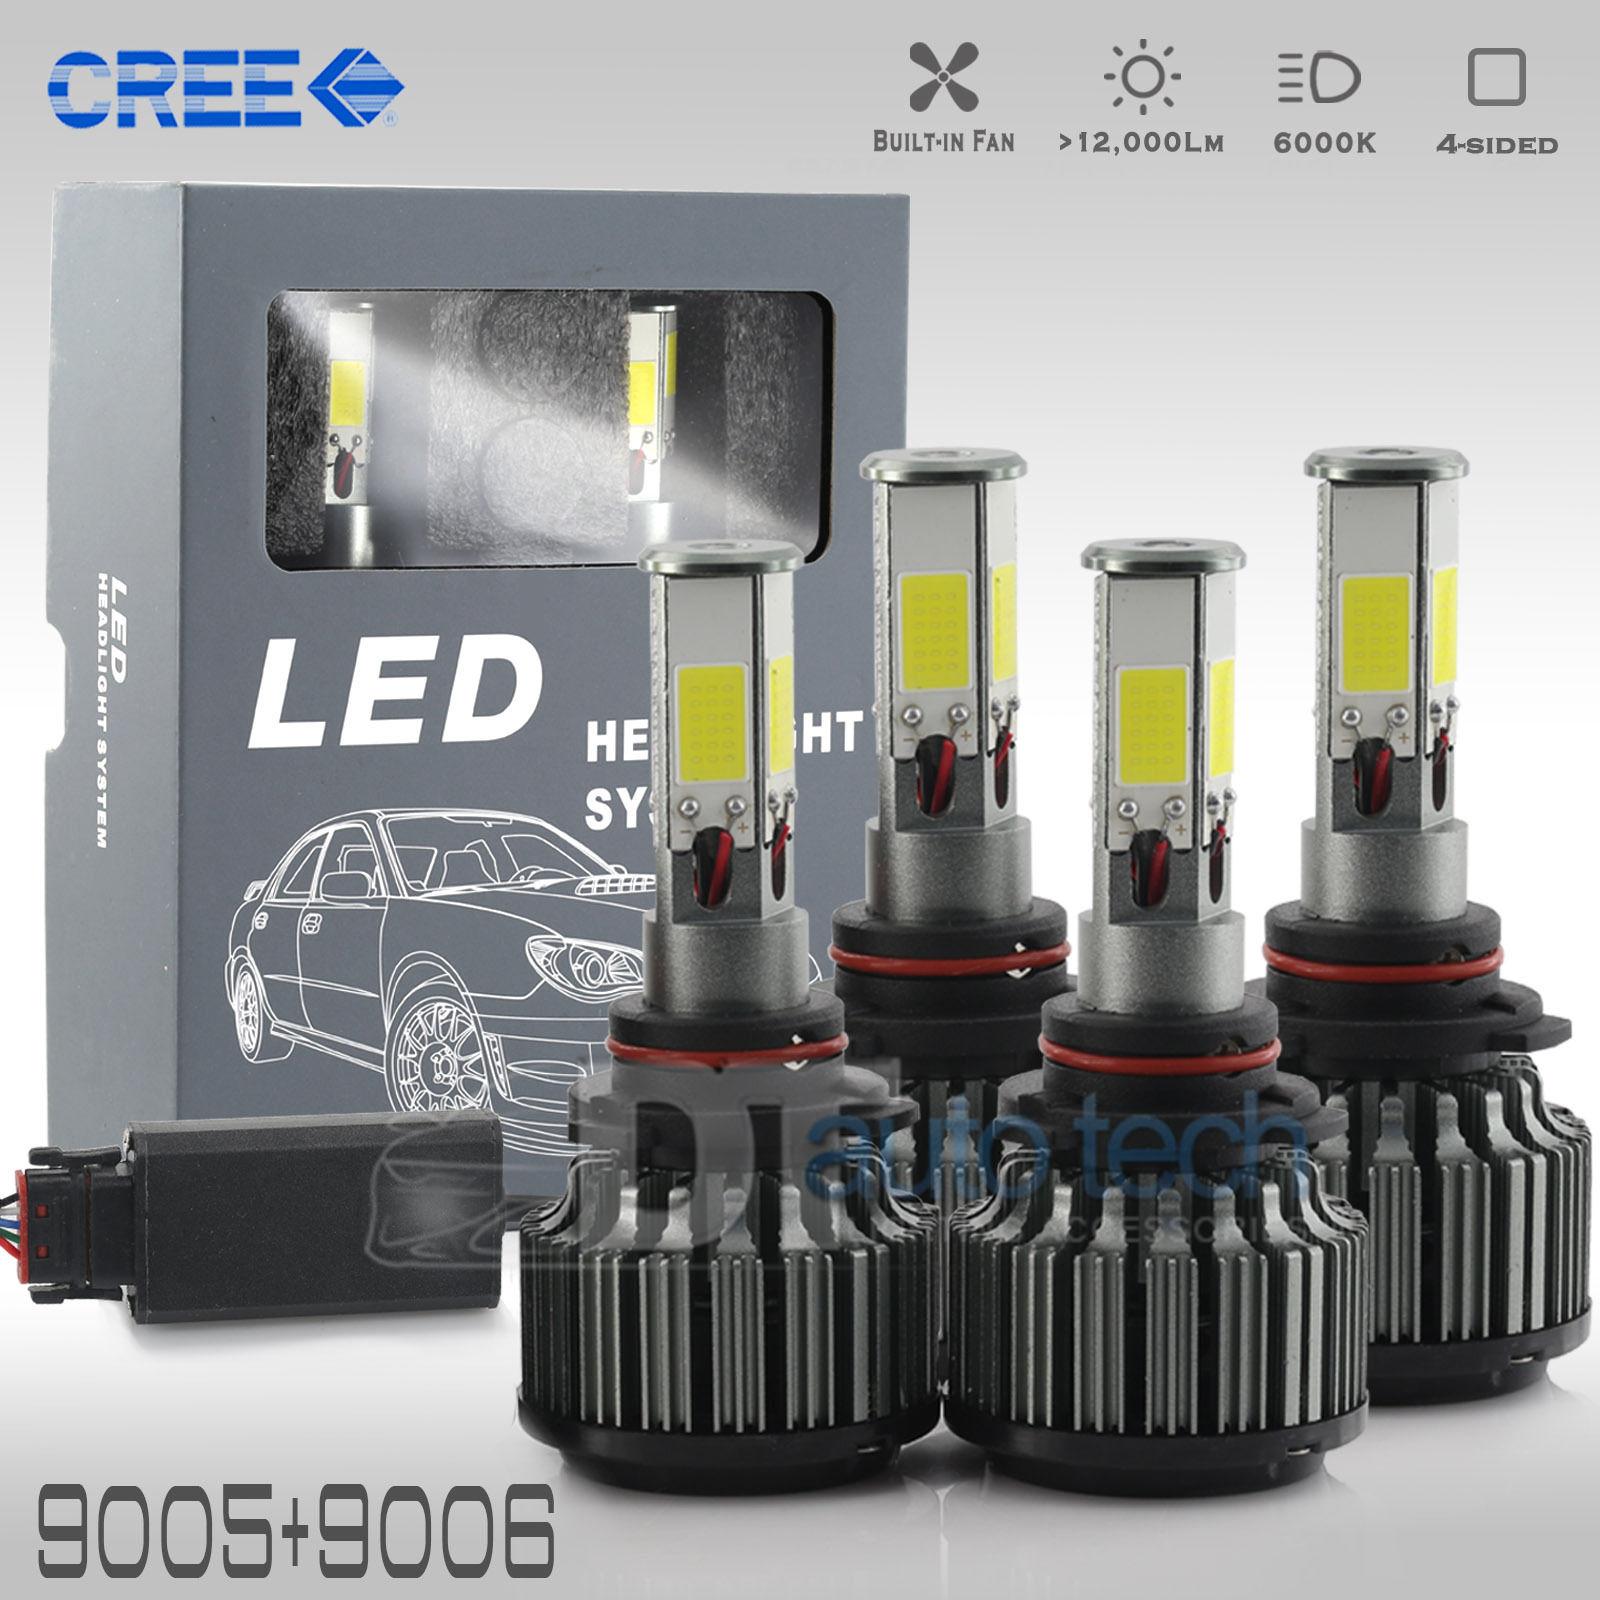 Amazing 9005+9006 Combo 240W 24000LM CREE LED Headlight Kit High & Low Beam  Light Bulbs 2018-2019